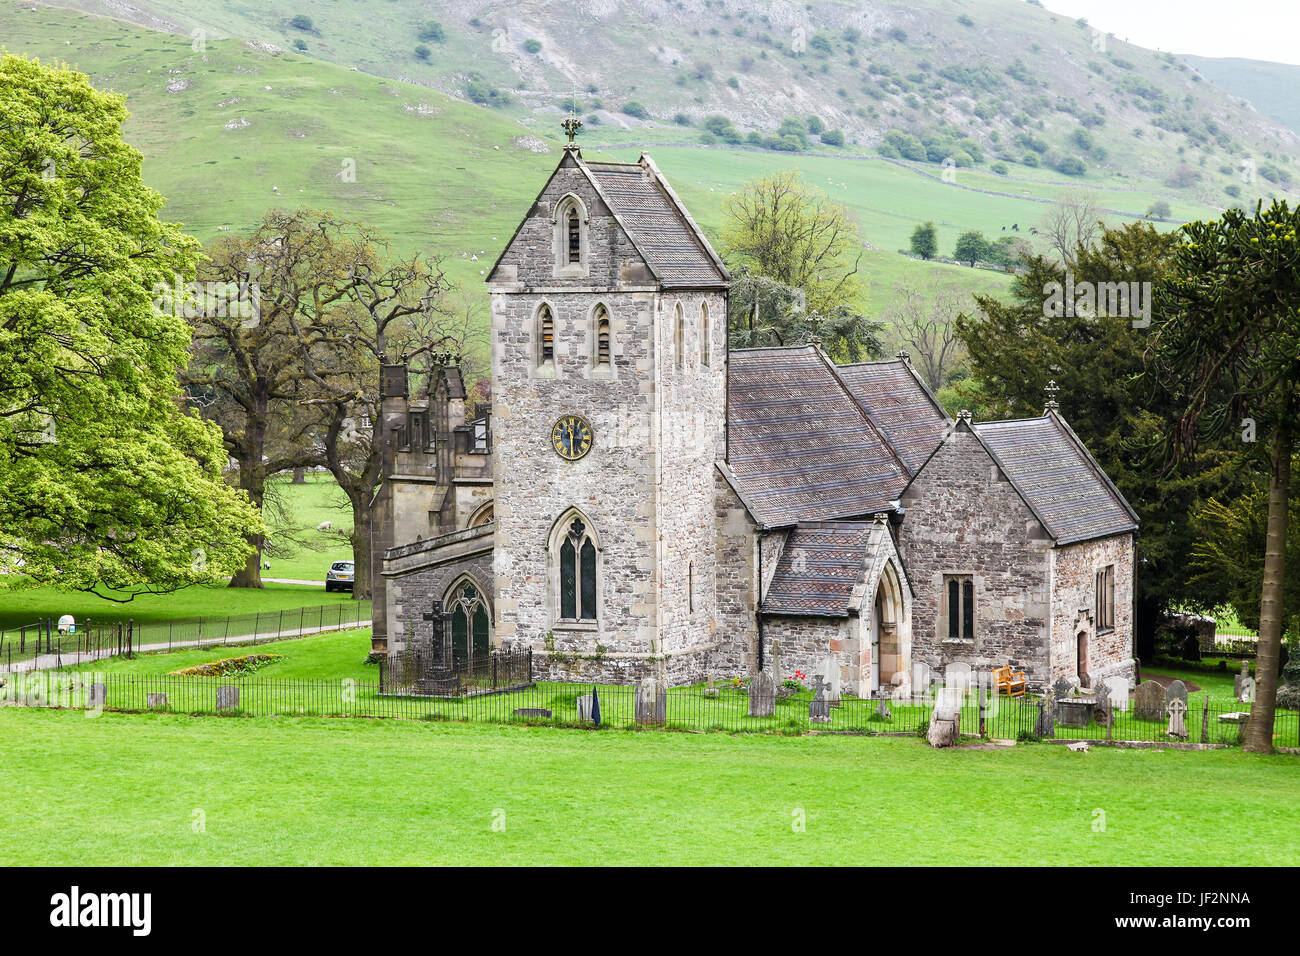 Church Of The Holy Cross Ilam, Staffordshire, England, UK - Stock Image